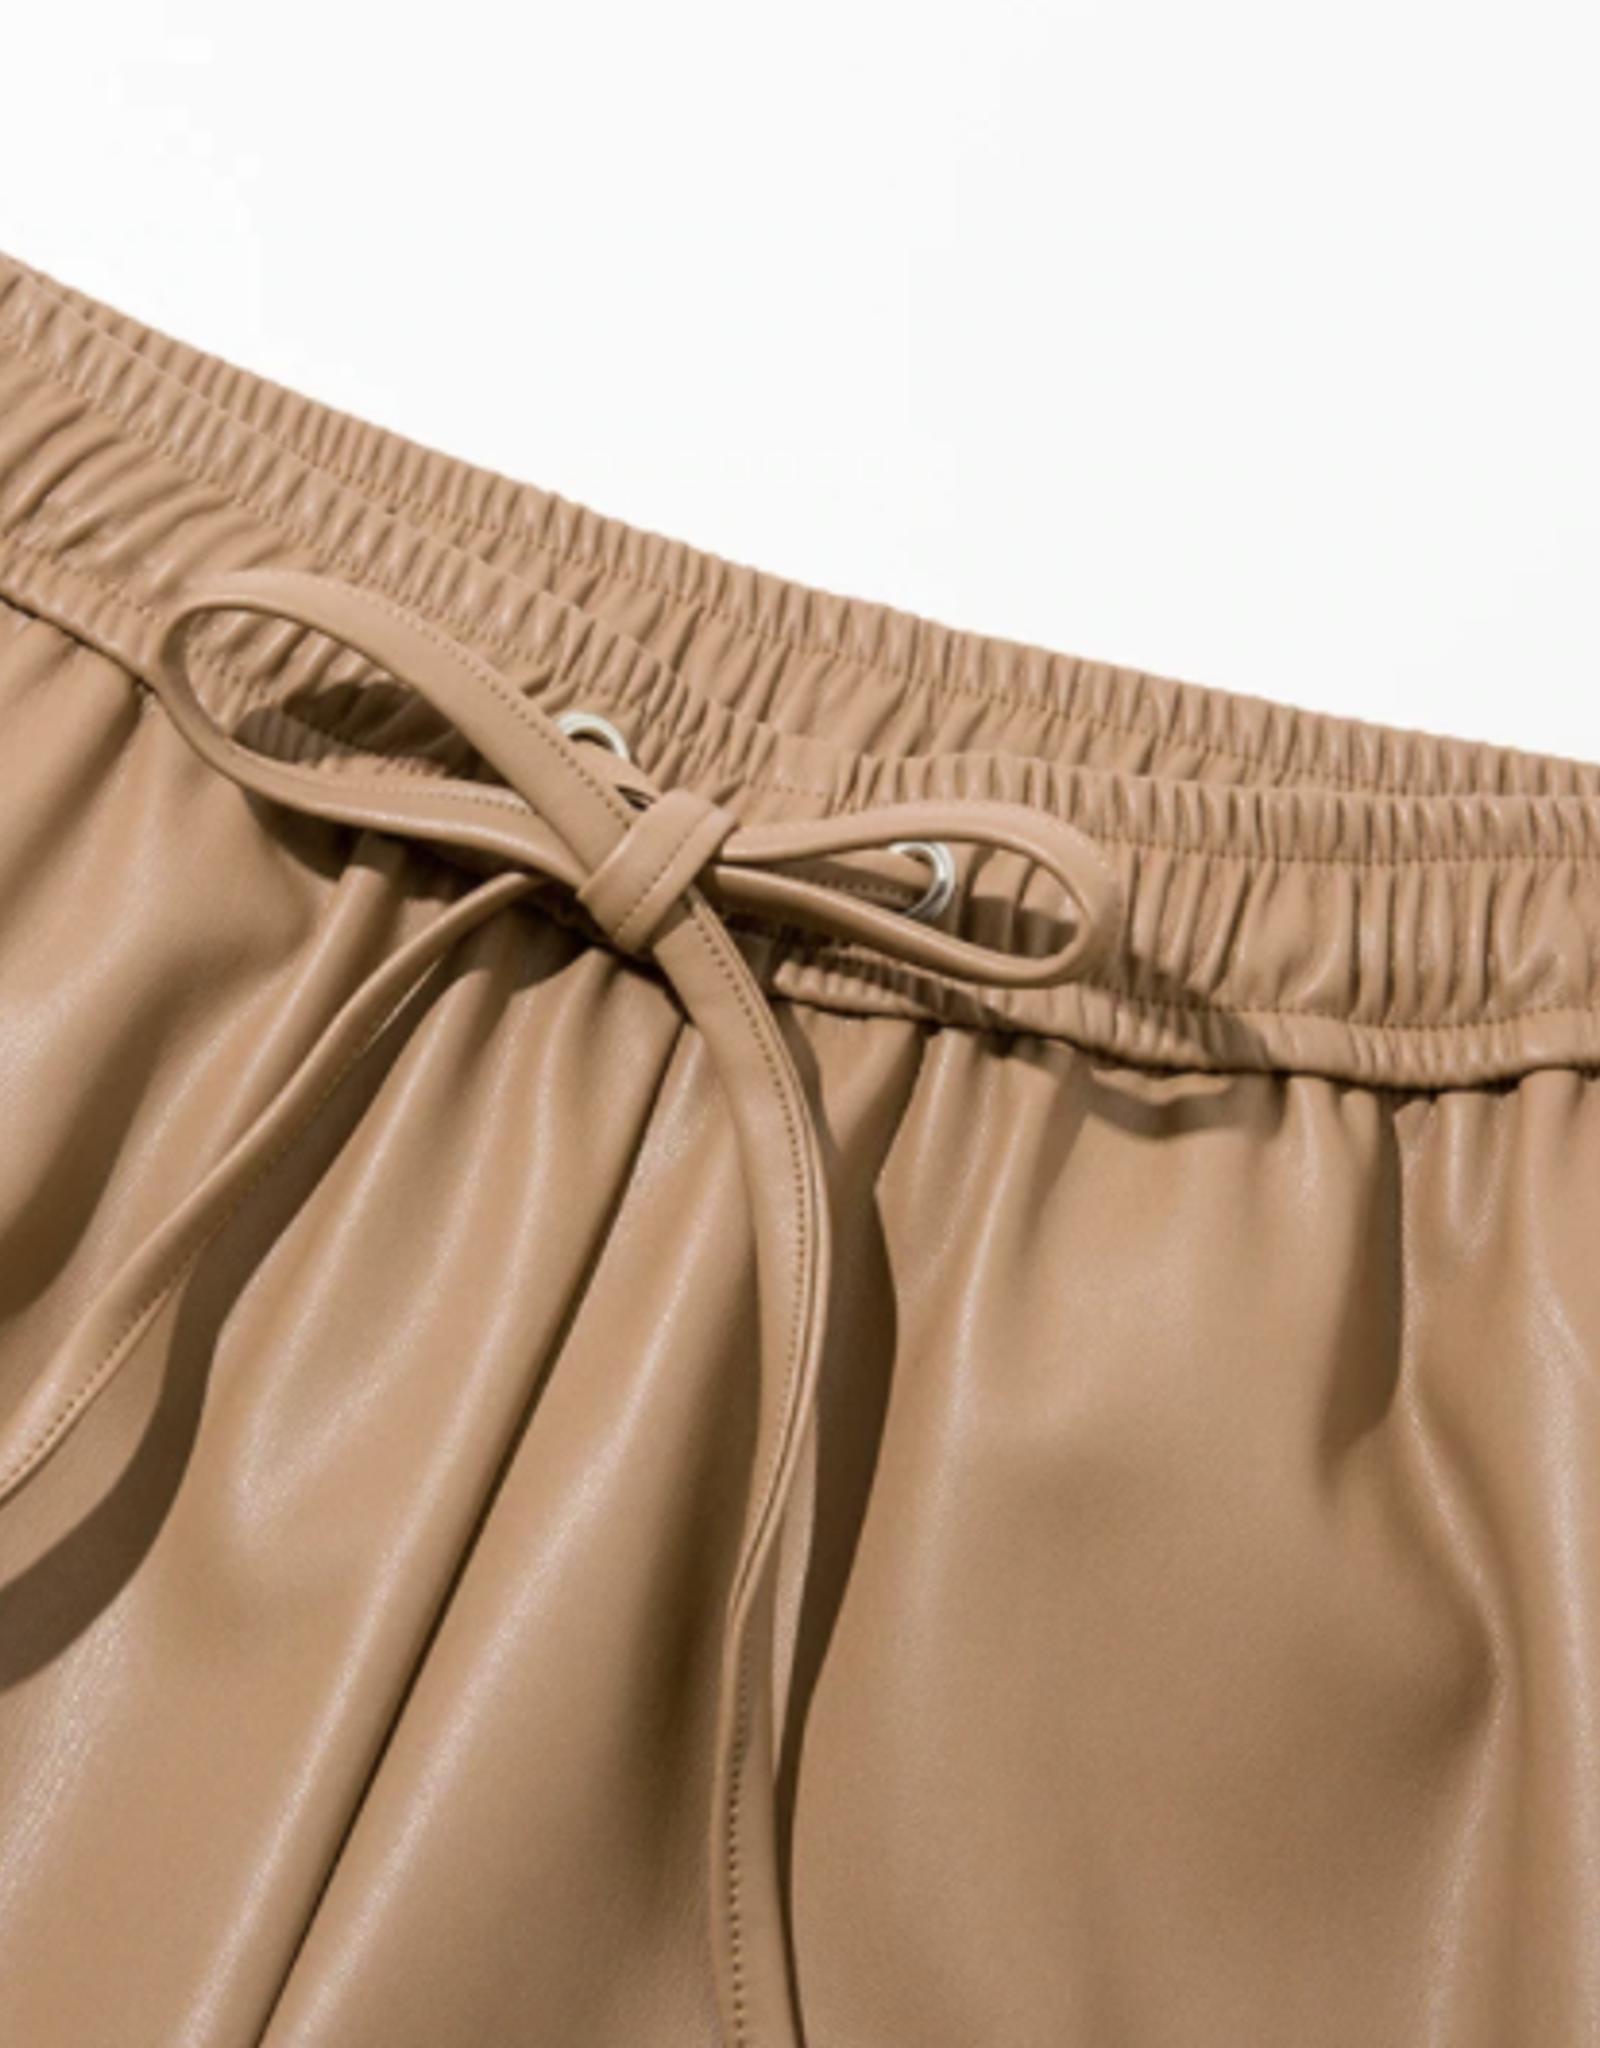 Wyld Blue Camel Leather Drawstring Pants